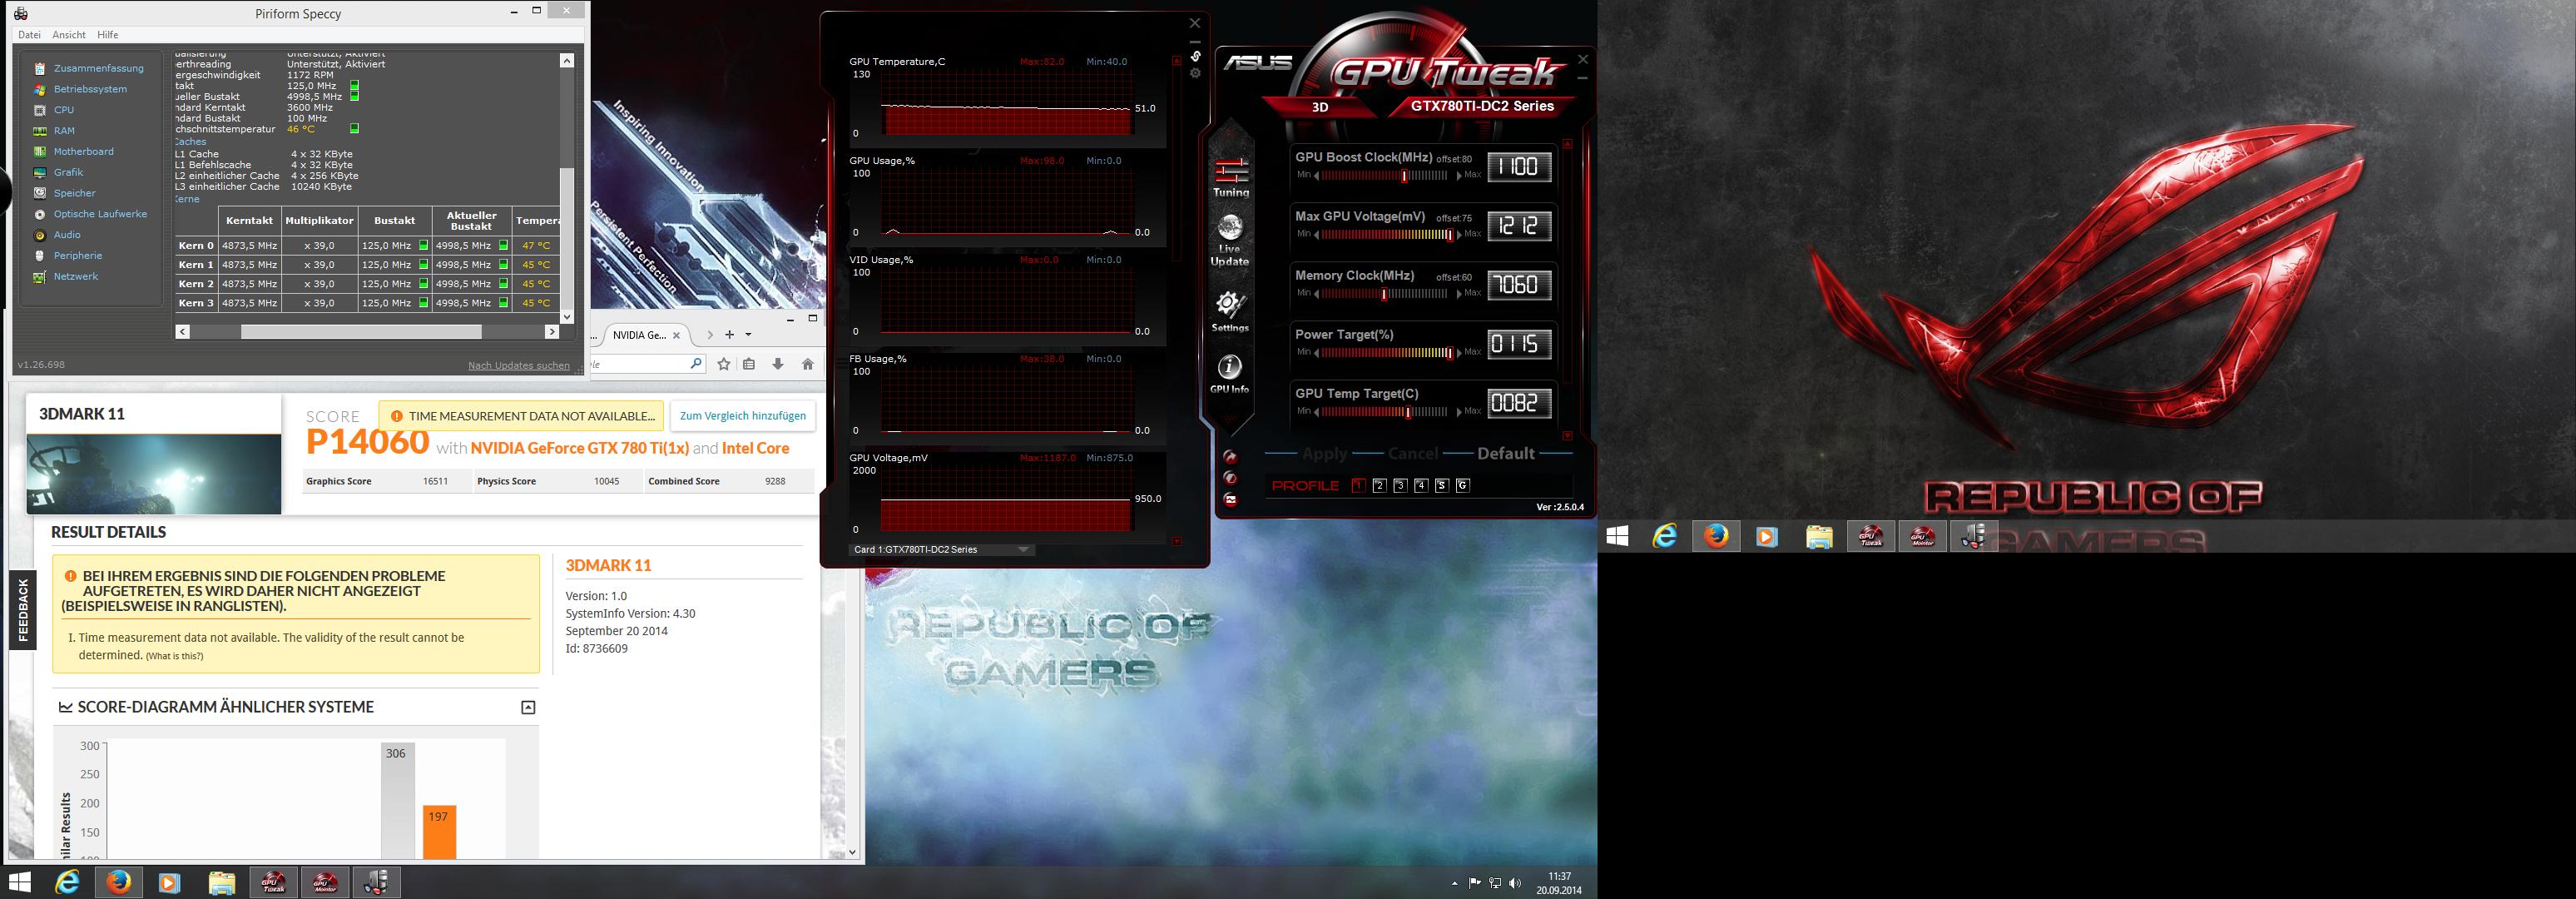 screenshot-2014-09-20-11-37-30-png.771912